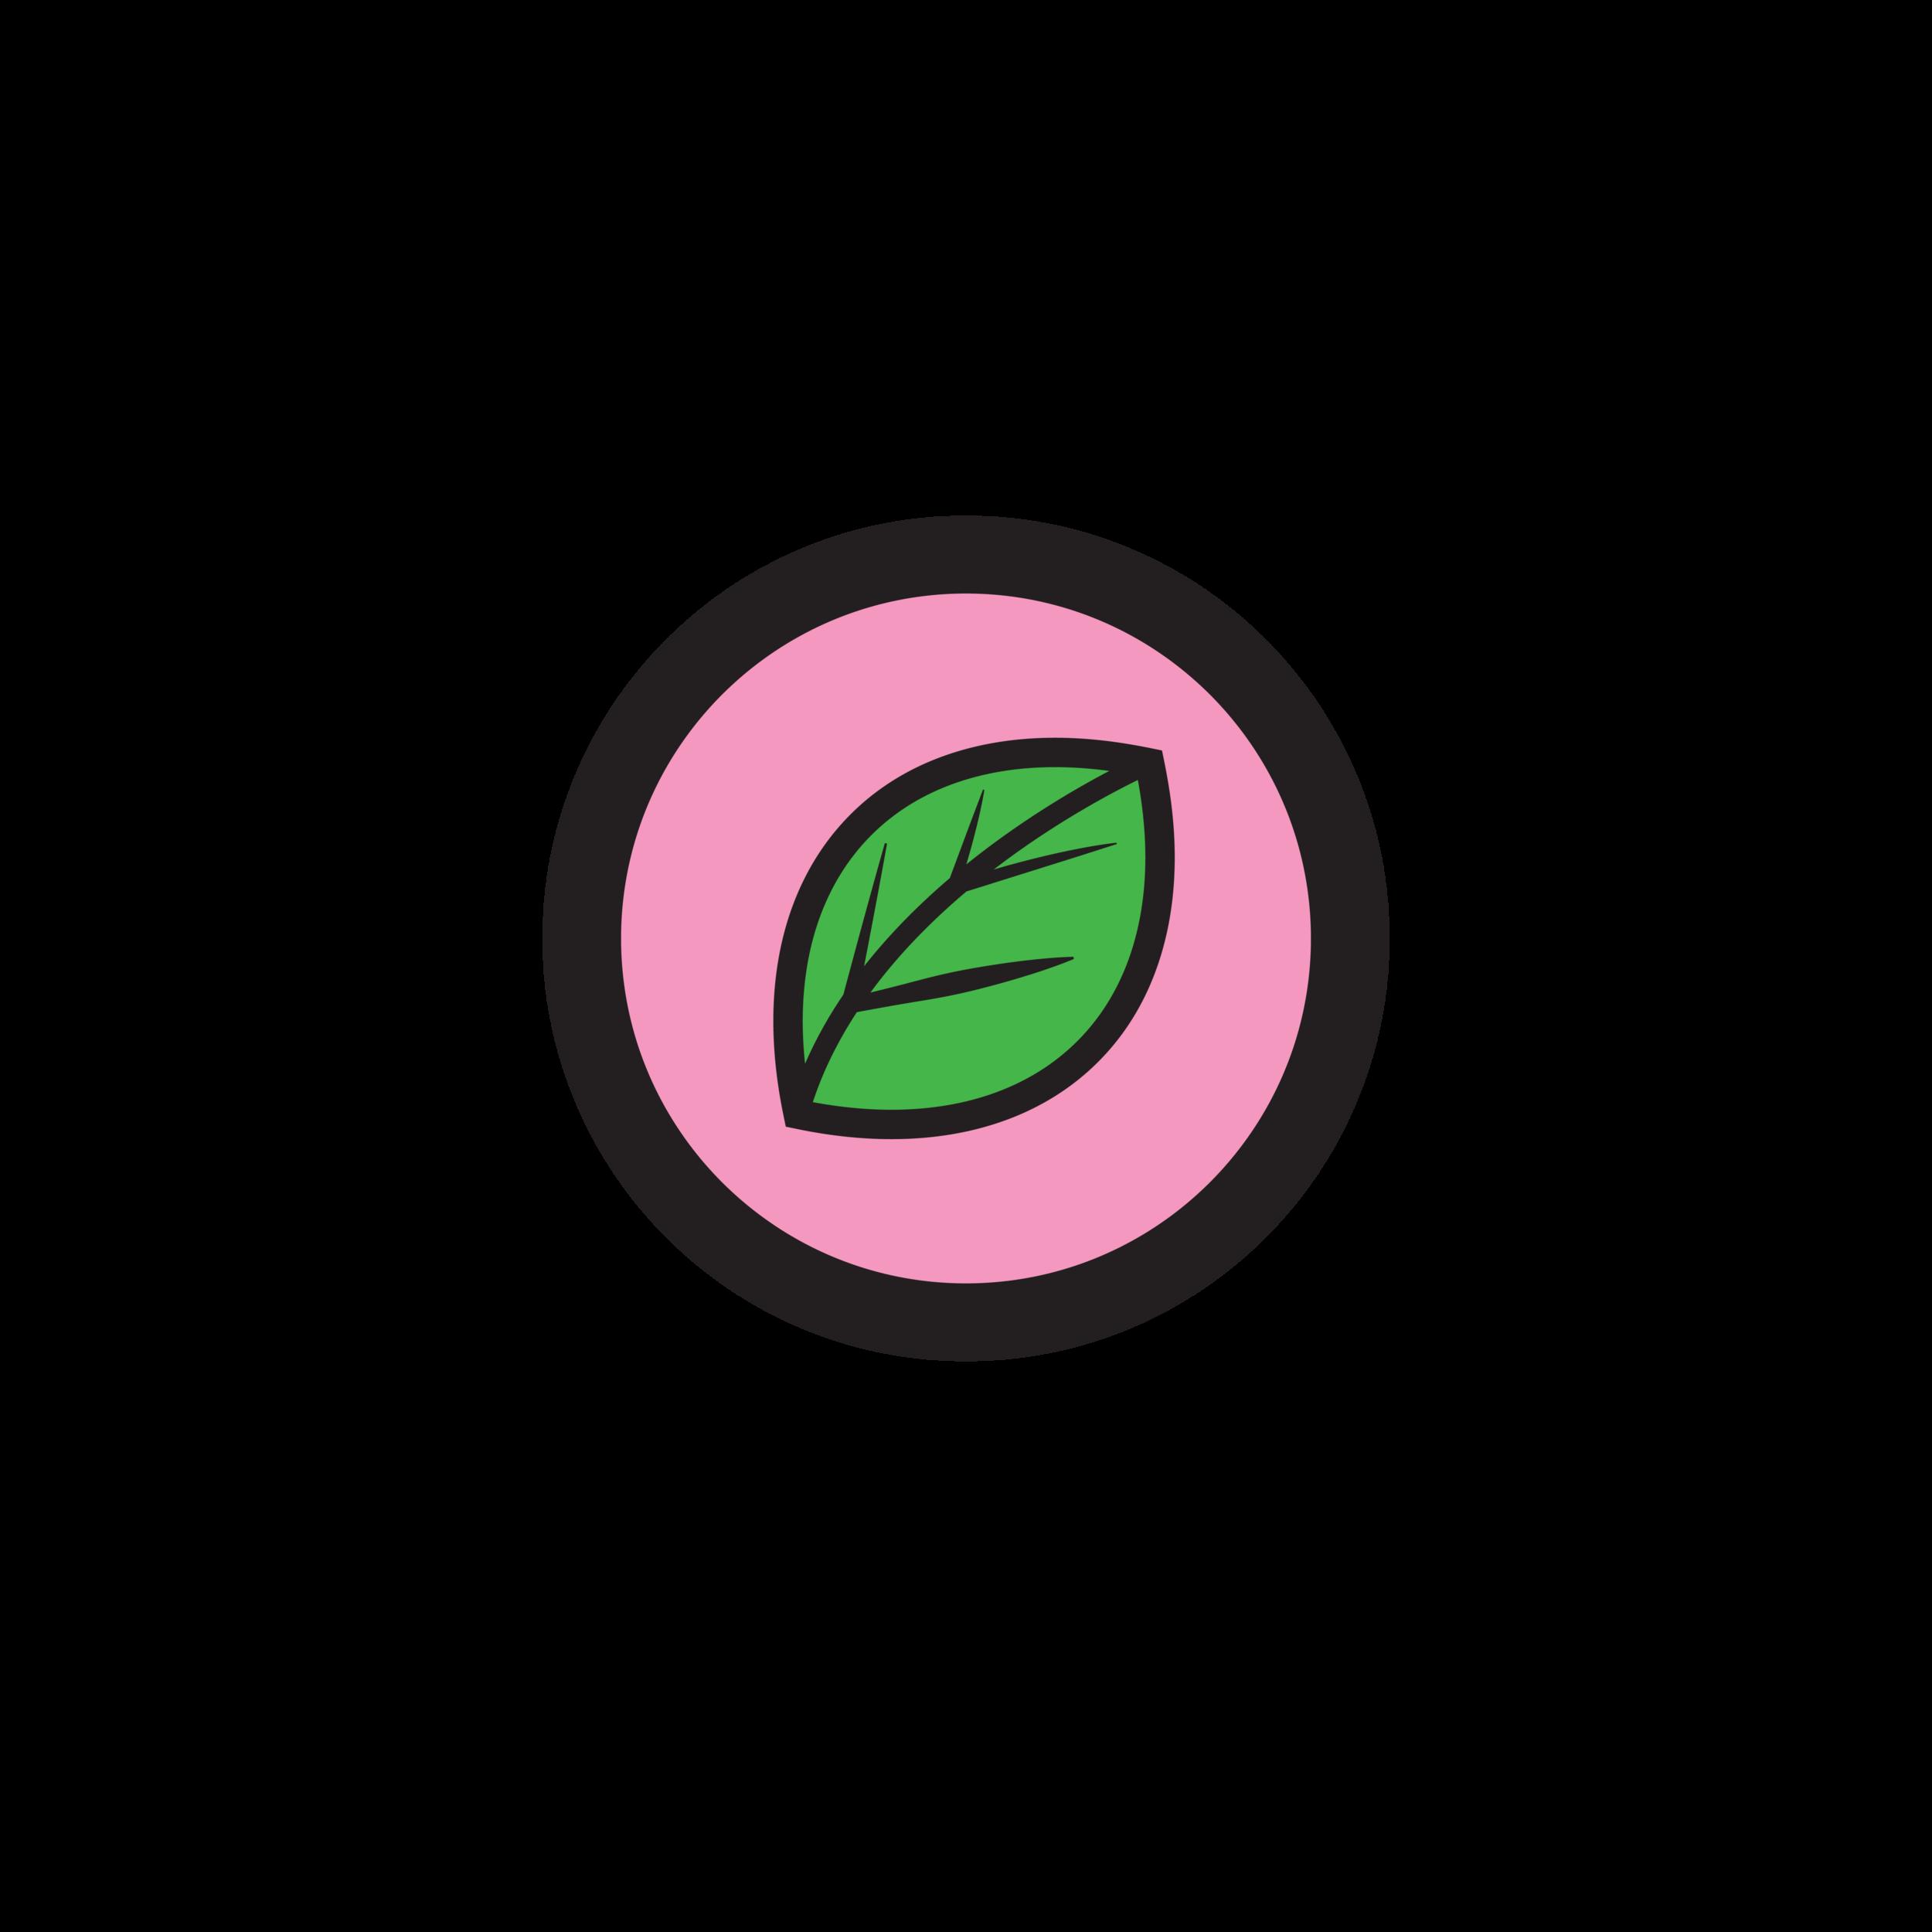 fruition(leaf badge with transparent background)-01.png